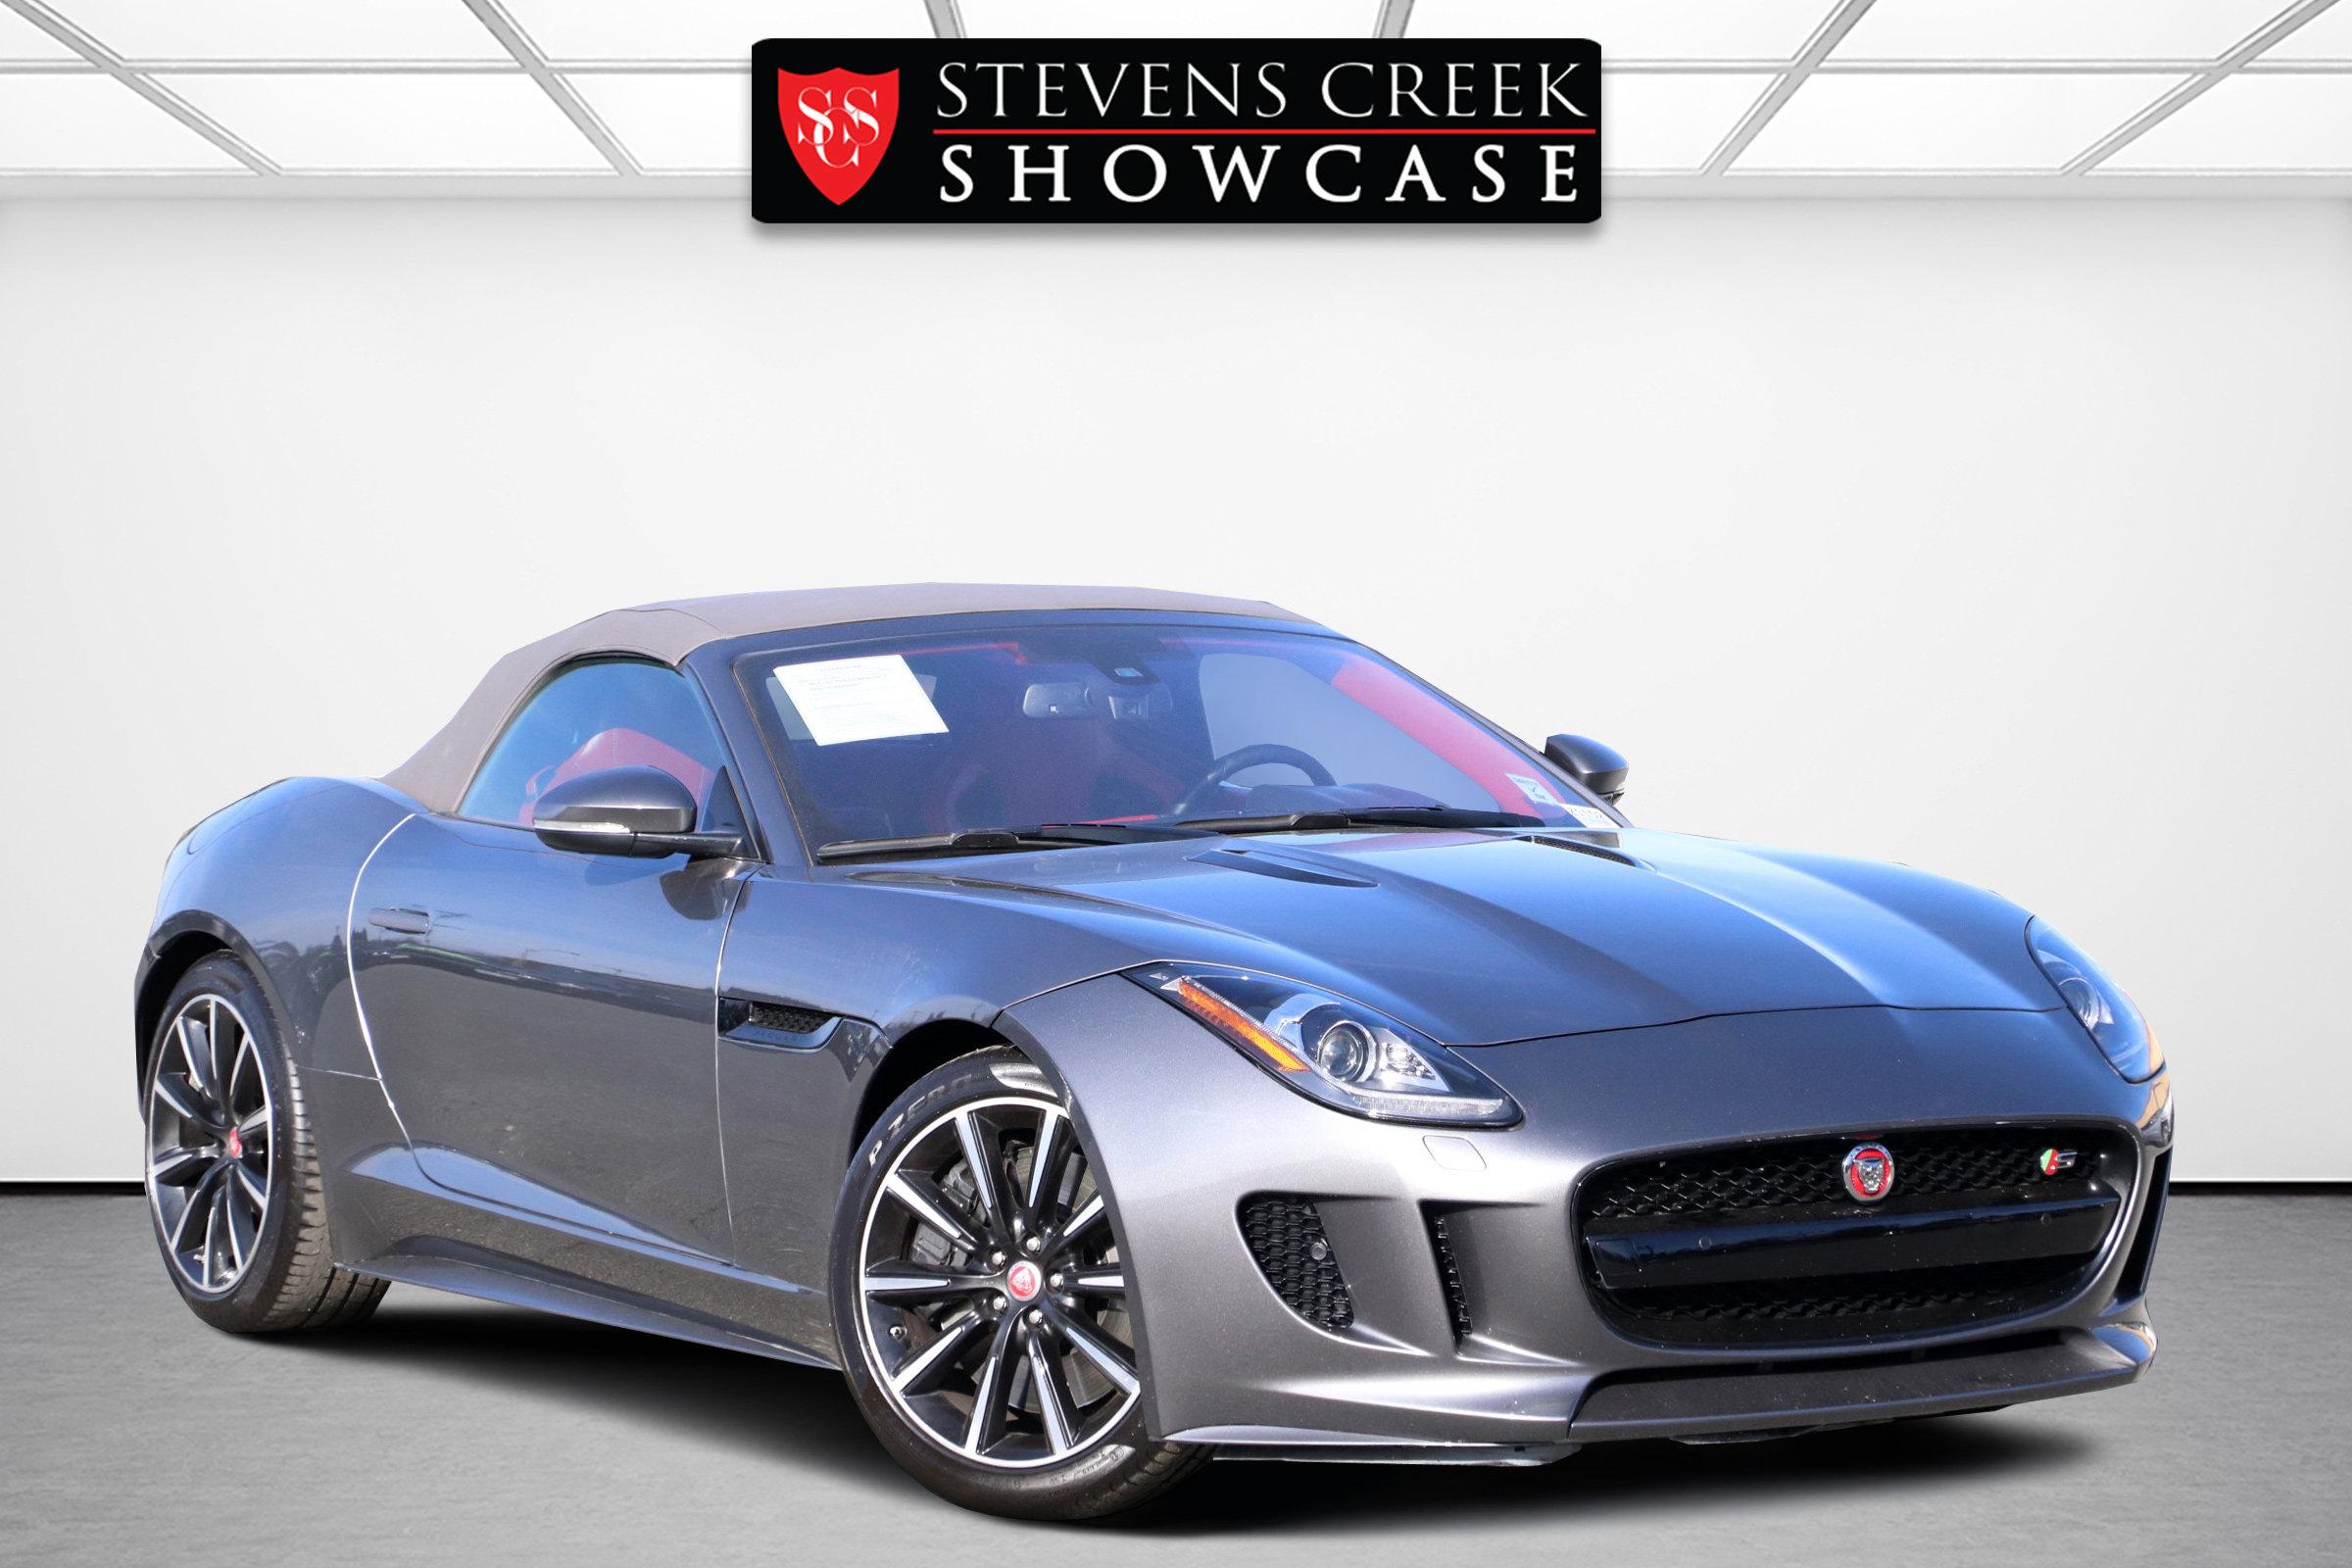 2017 Jaguar F-TYPE S Convertible image